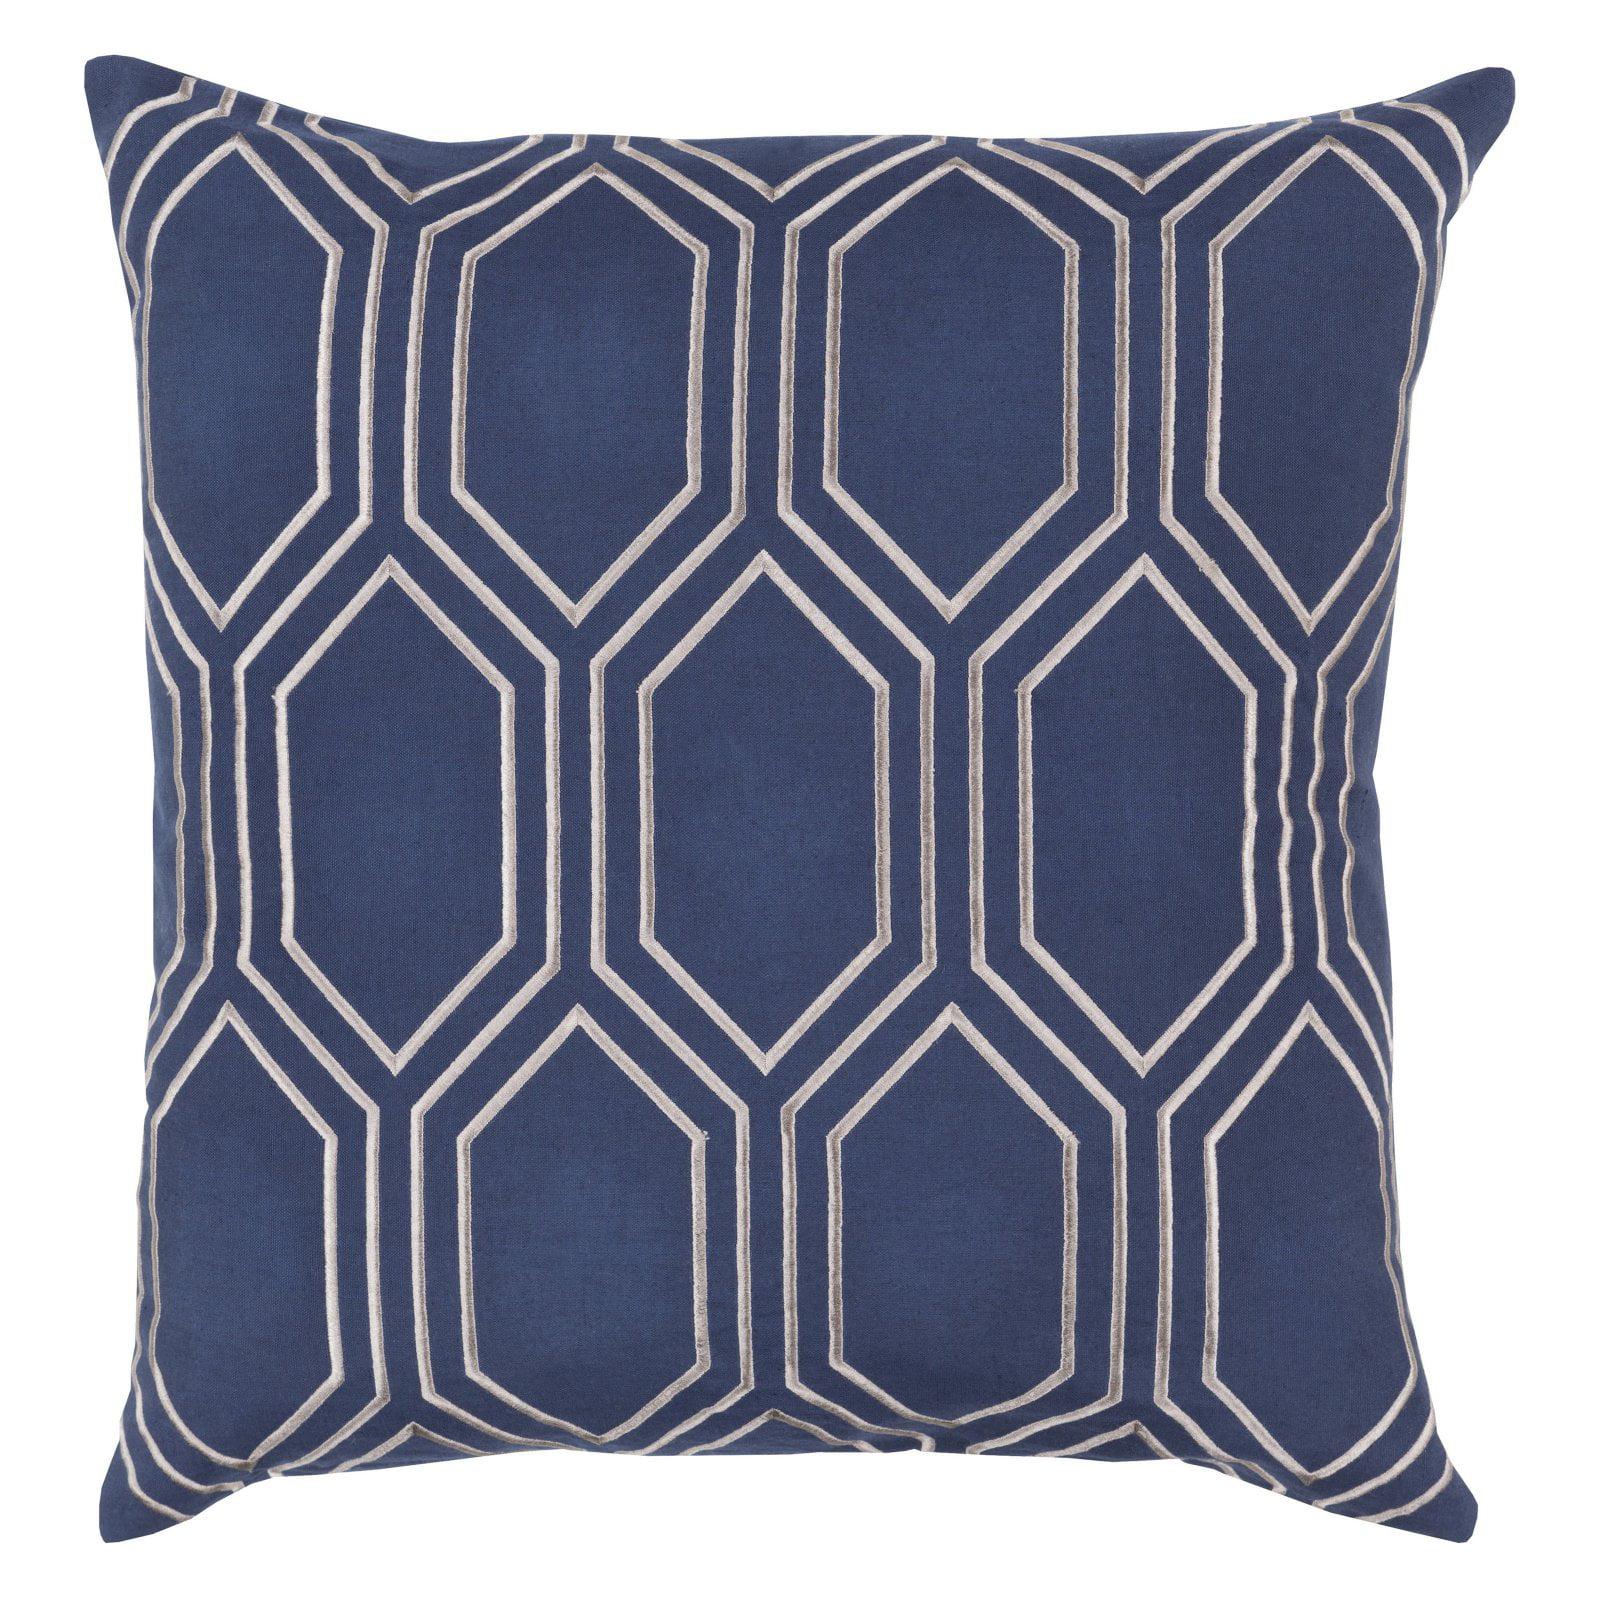 Surya Skyline I Decorative Throw Pillow